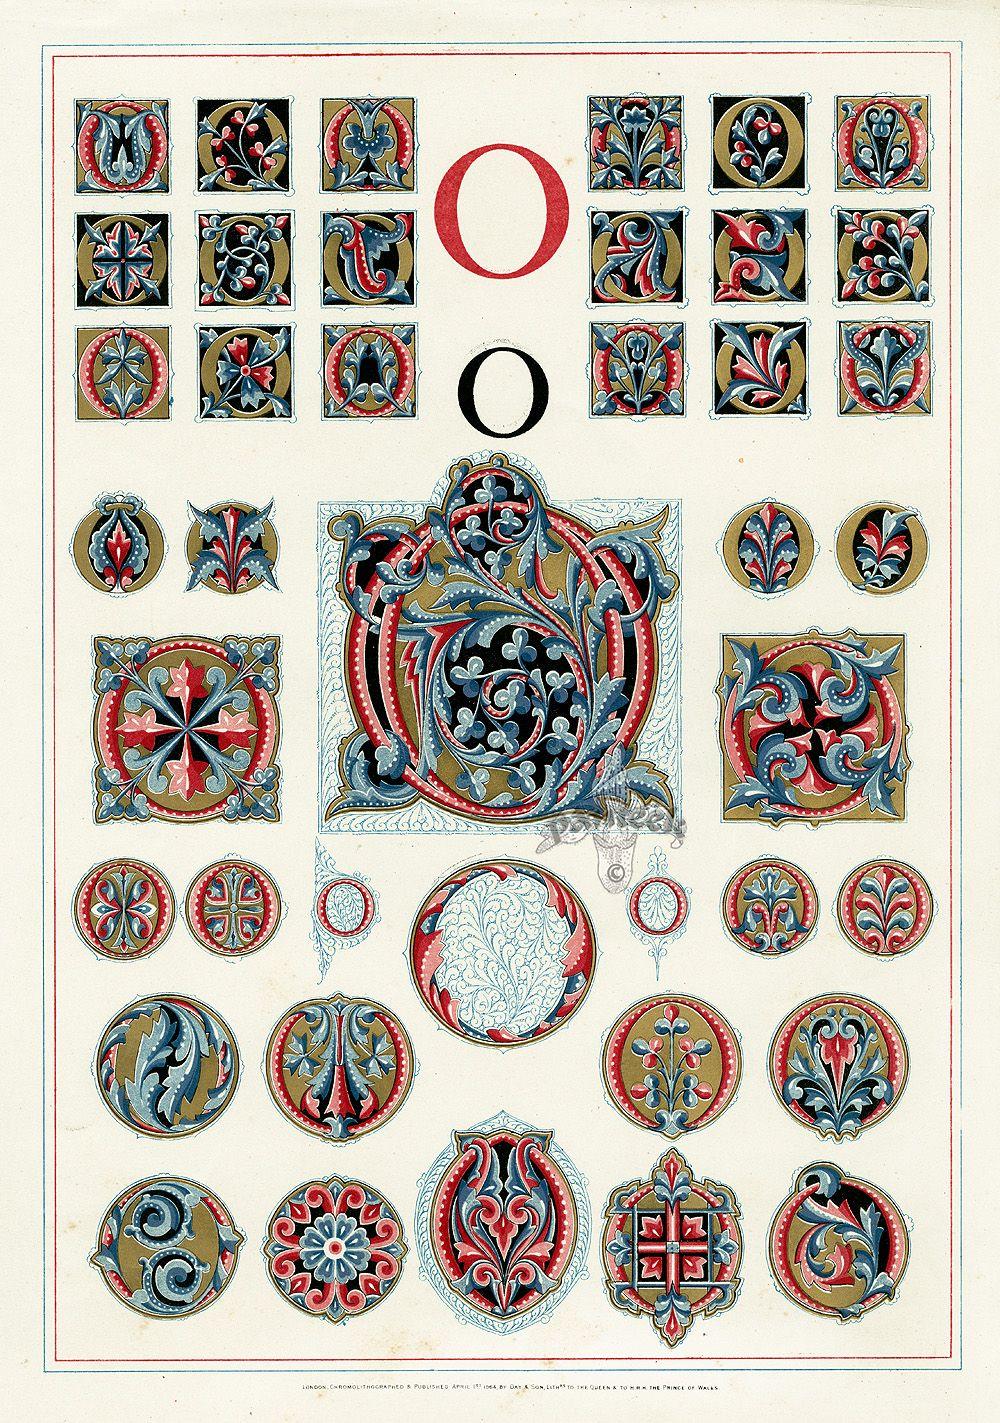 owen jones alphabet 1864 graphics alphabet pinterest calligraphie lettres et typographie. Black Bedroom Furniture Sets. Home Design Ideas